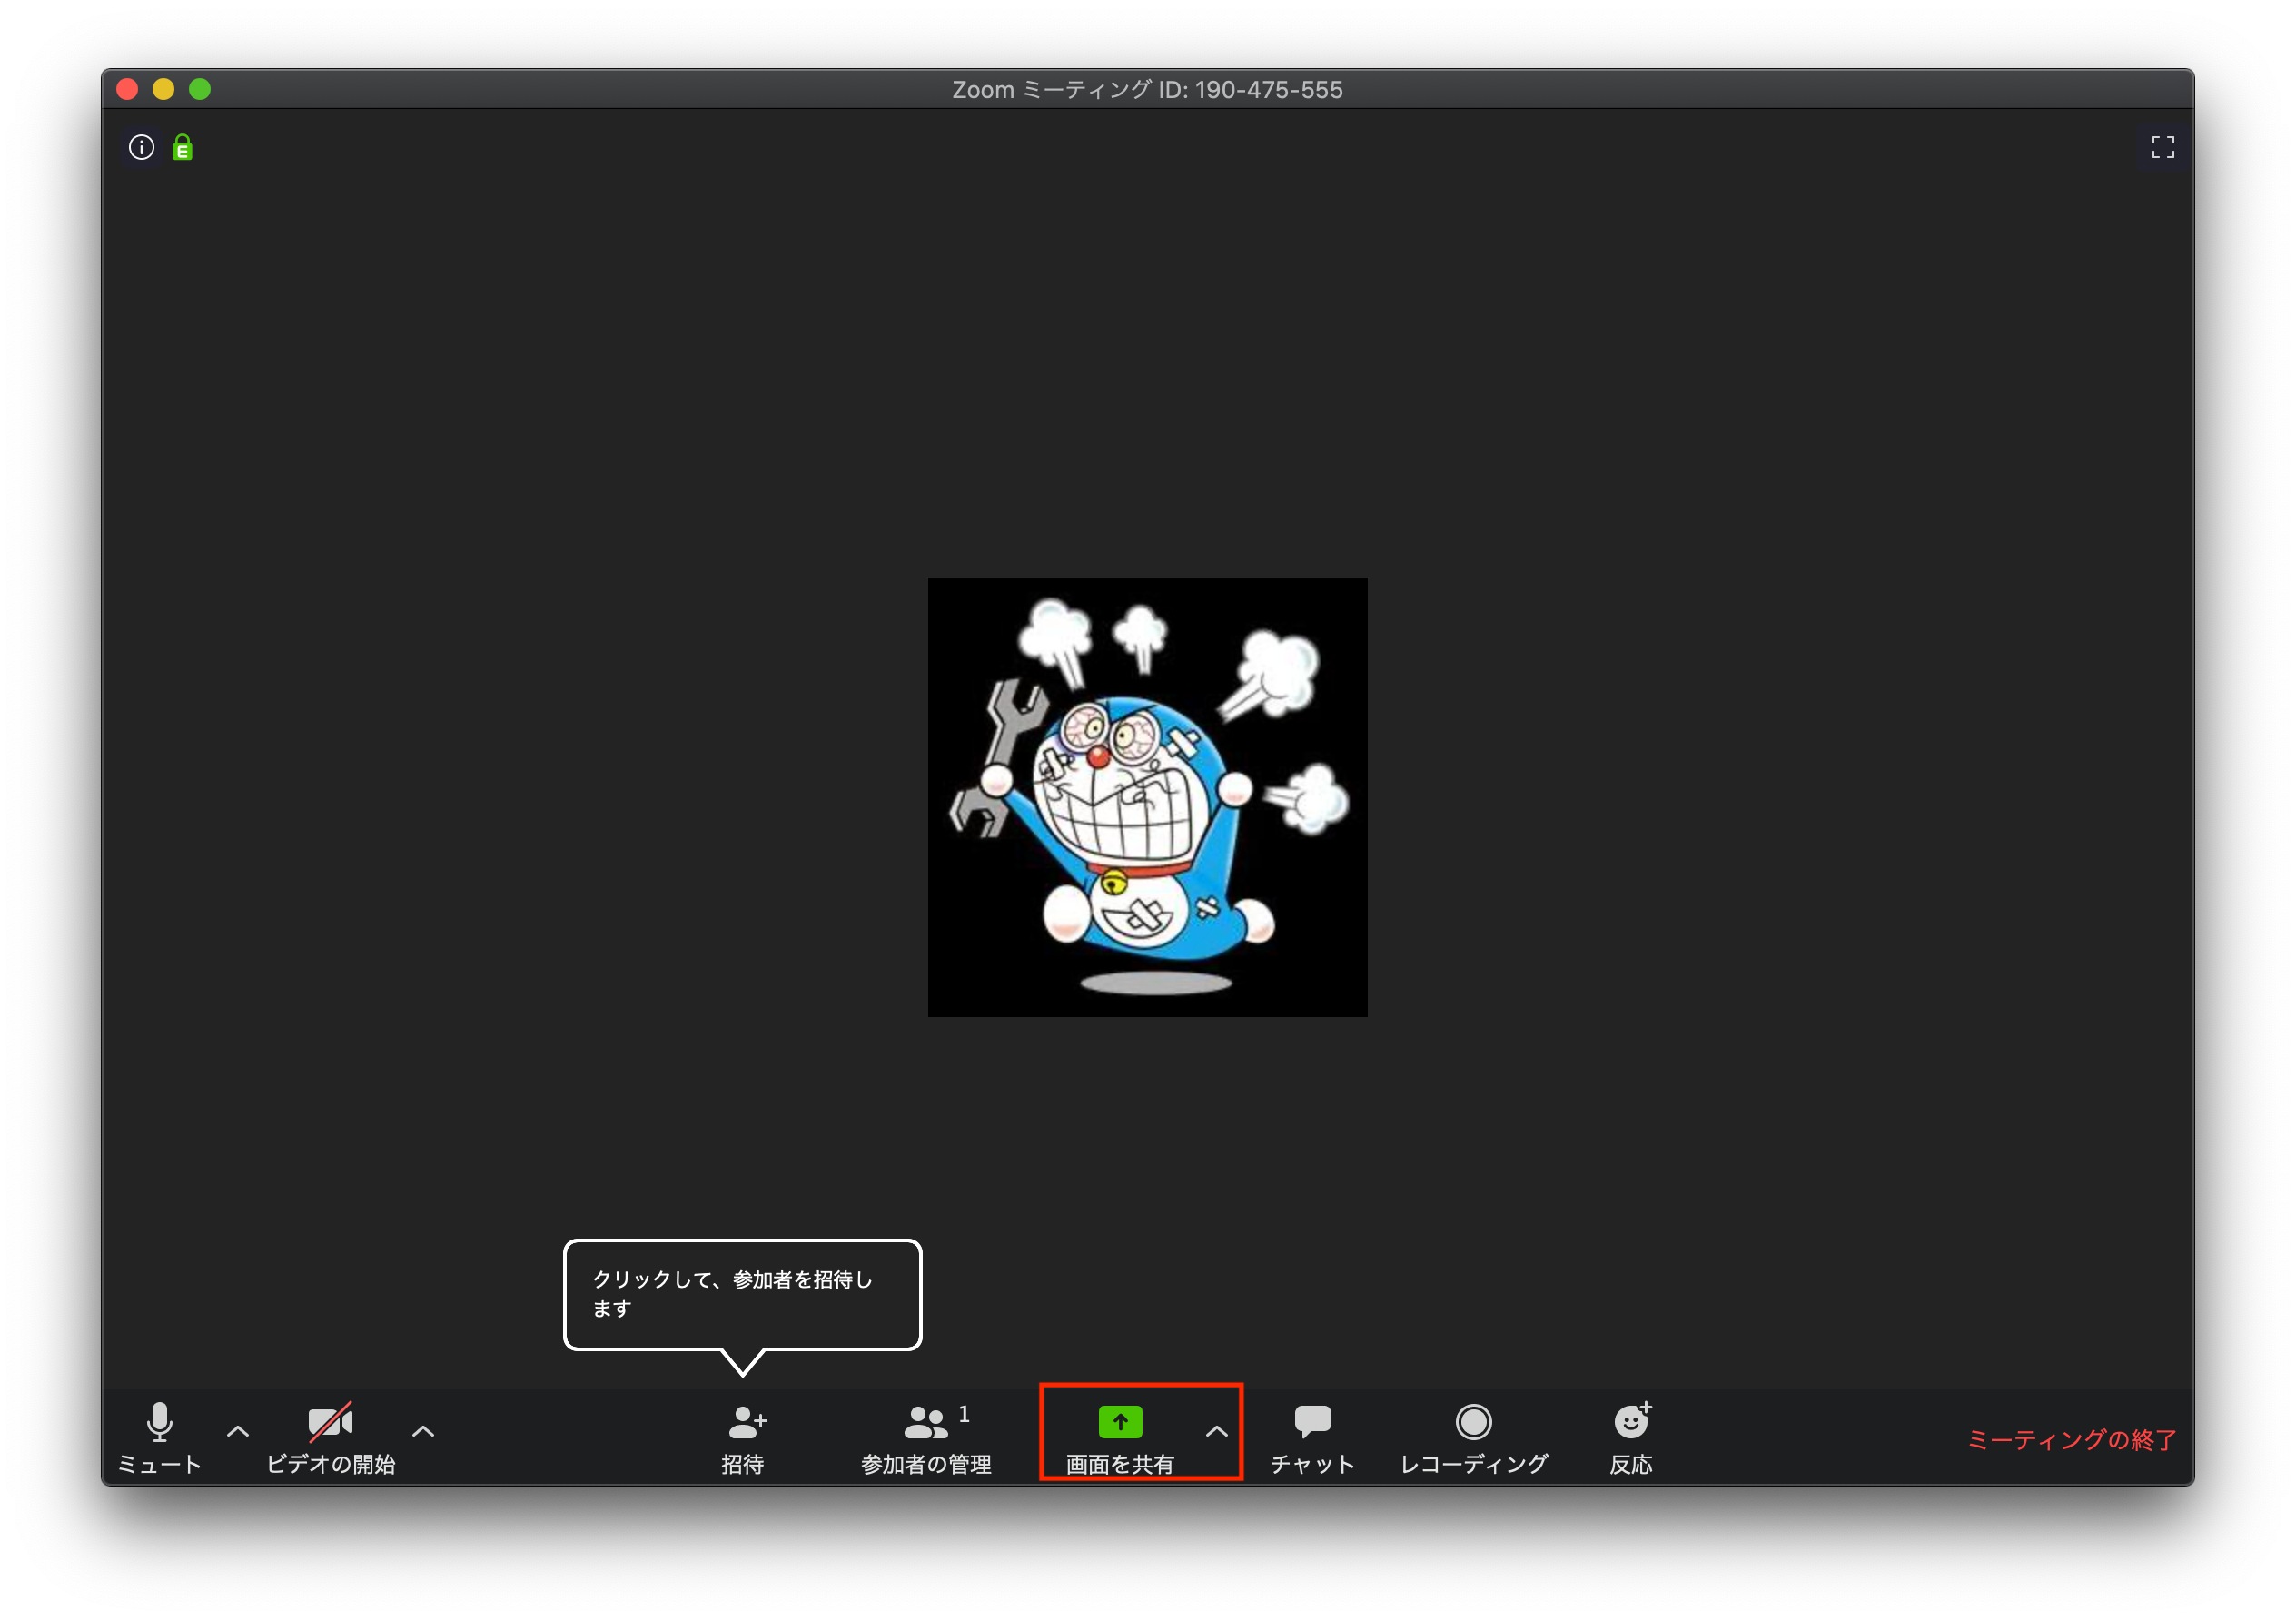 iosスクリーンショット 2020-03-04 19.48.57.png